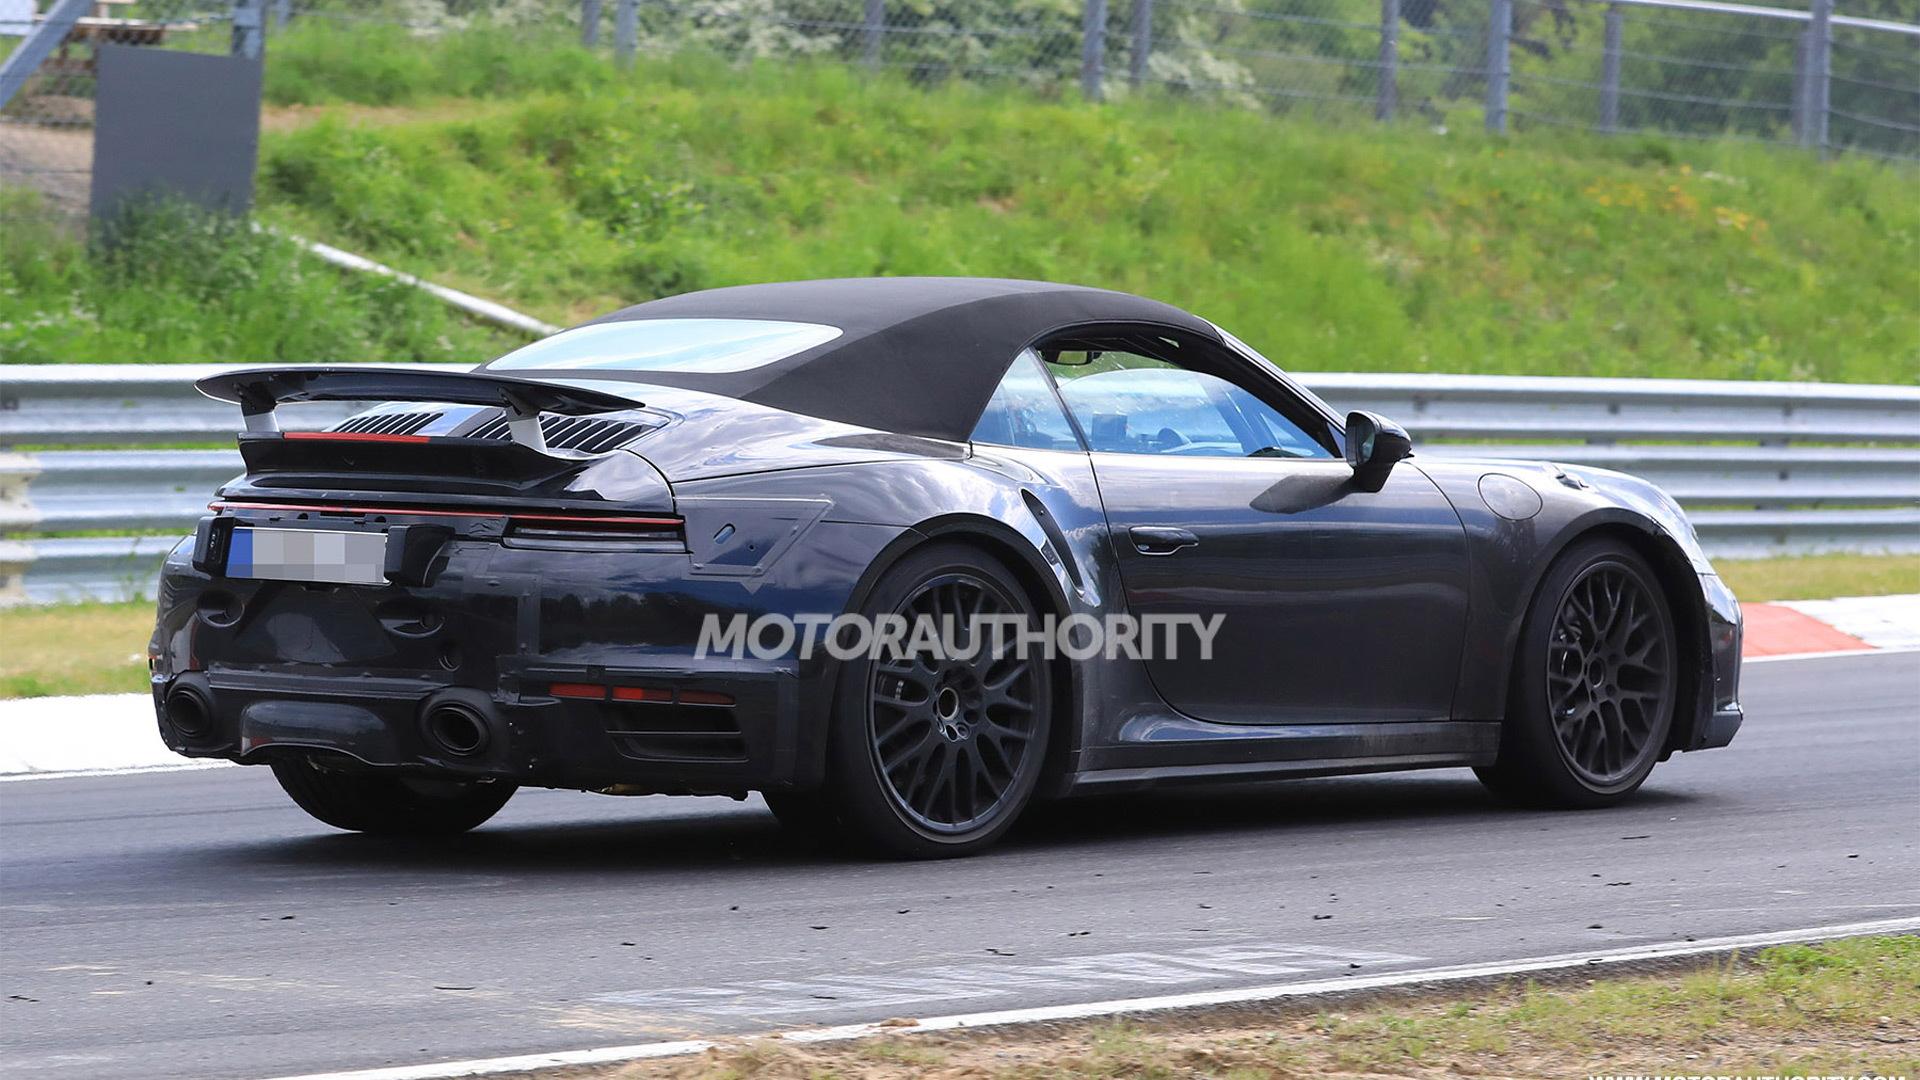 2020 Porsche 911 Turbo Cabriolet Spy Shots And Video